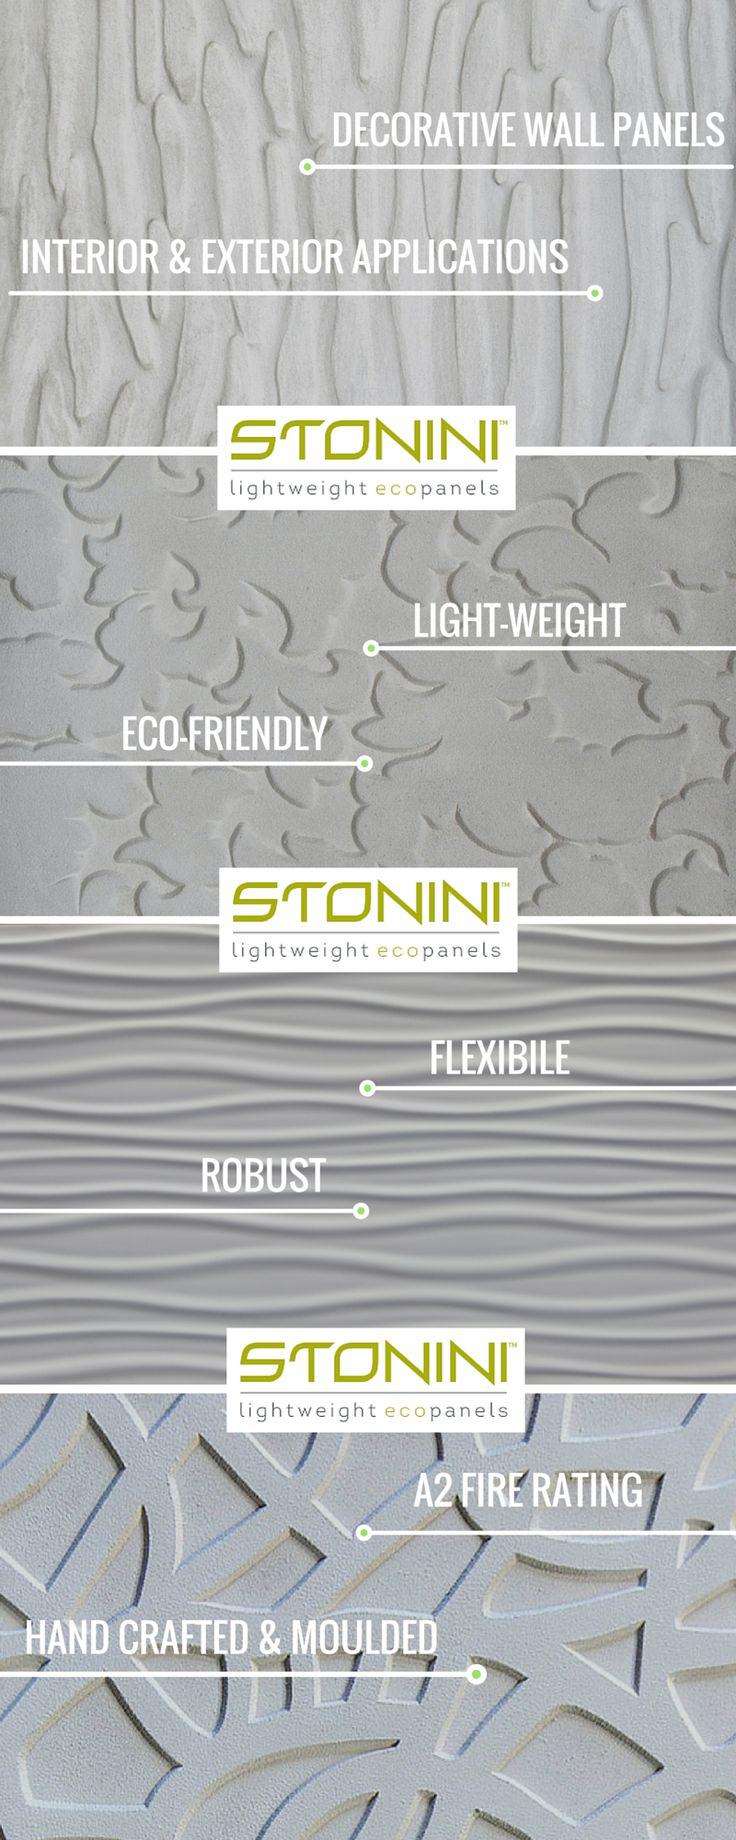 3d wall paneling ideals